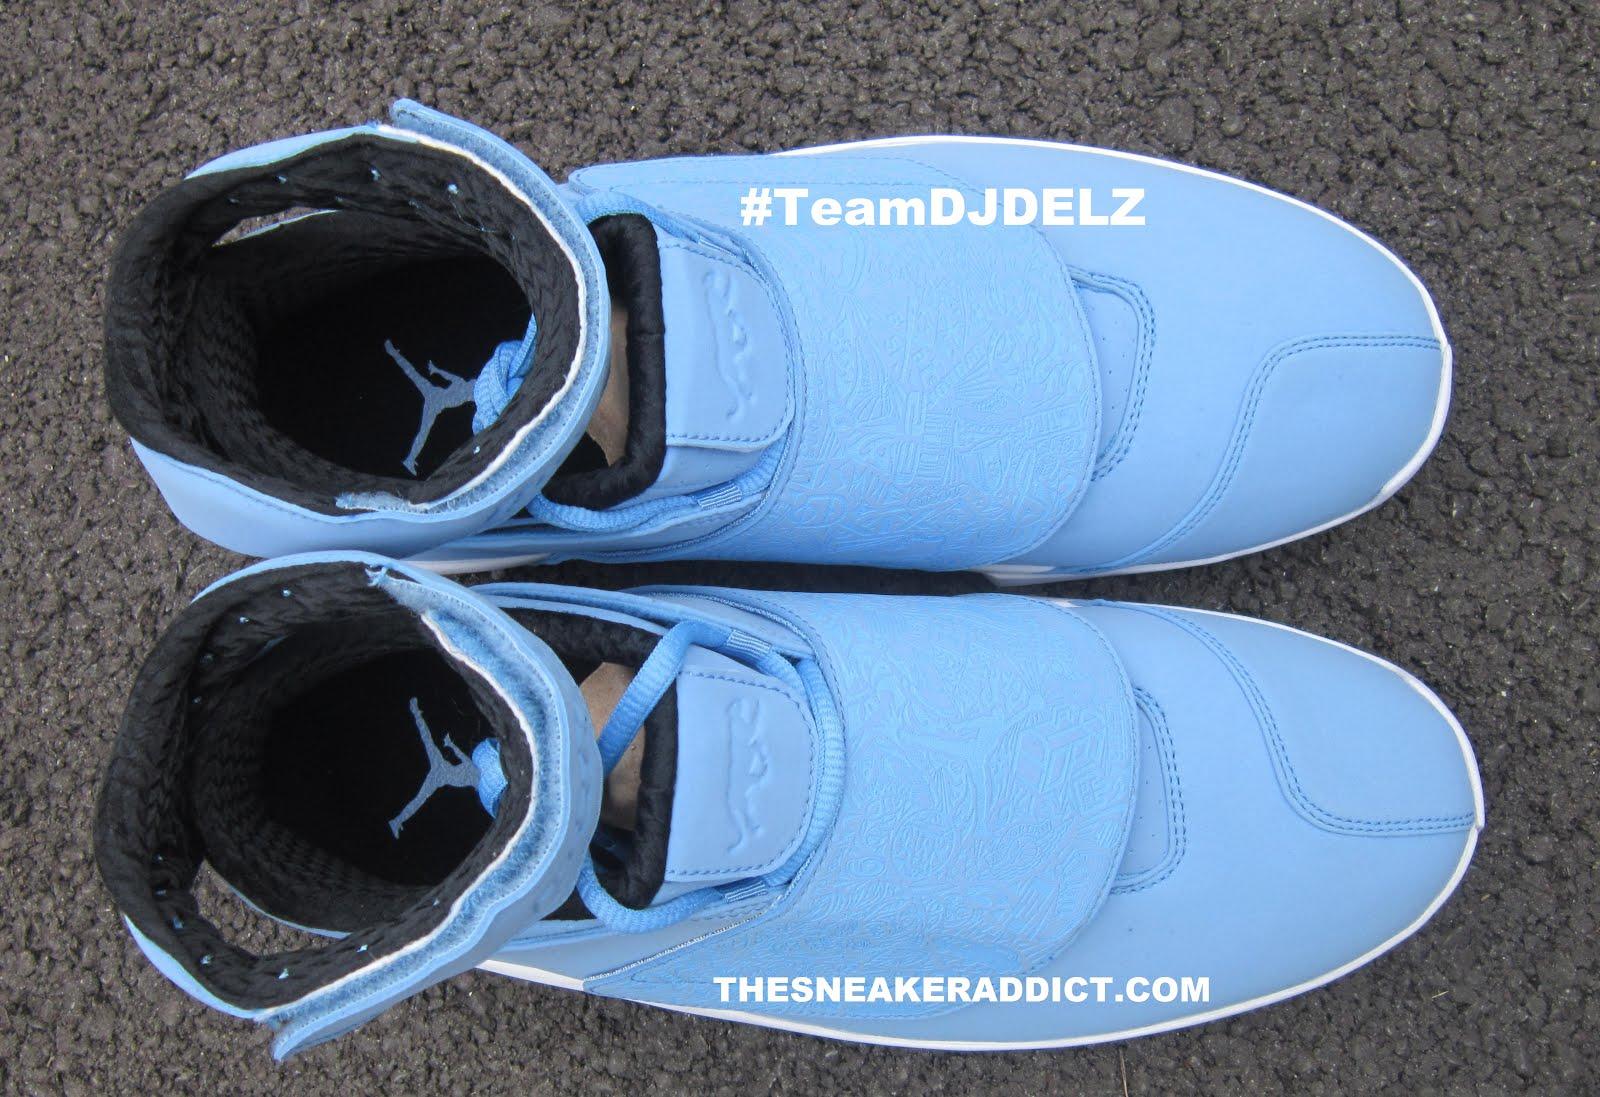 f680bc4d761 Here is a detailed look at the Unreleased Air Jordan Pantone 20 Sample  Sneaker